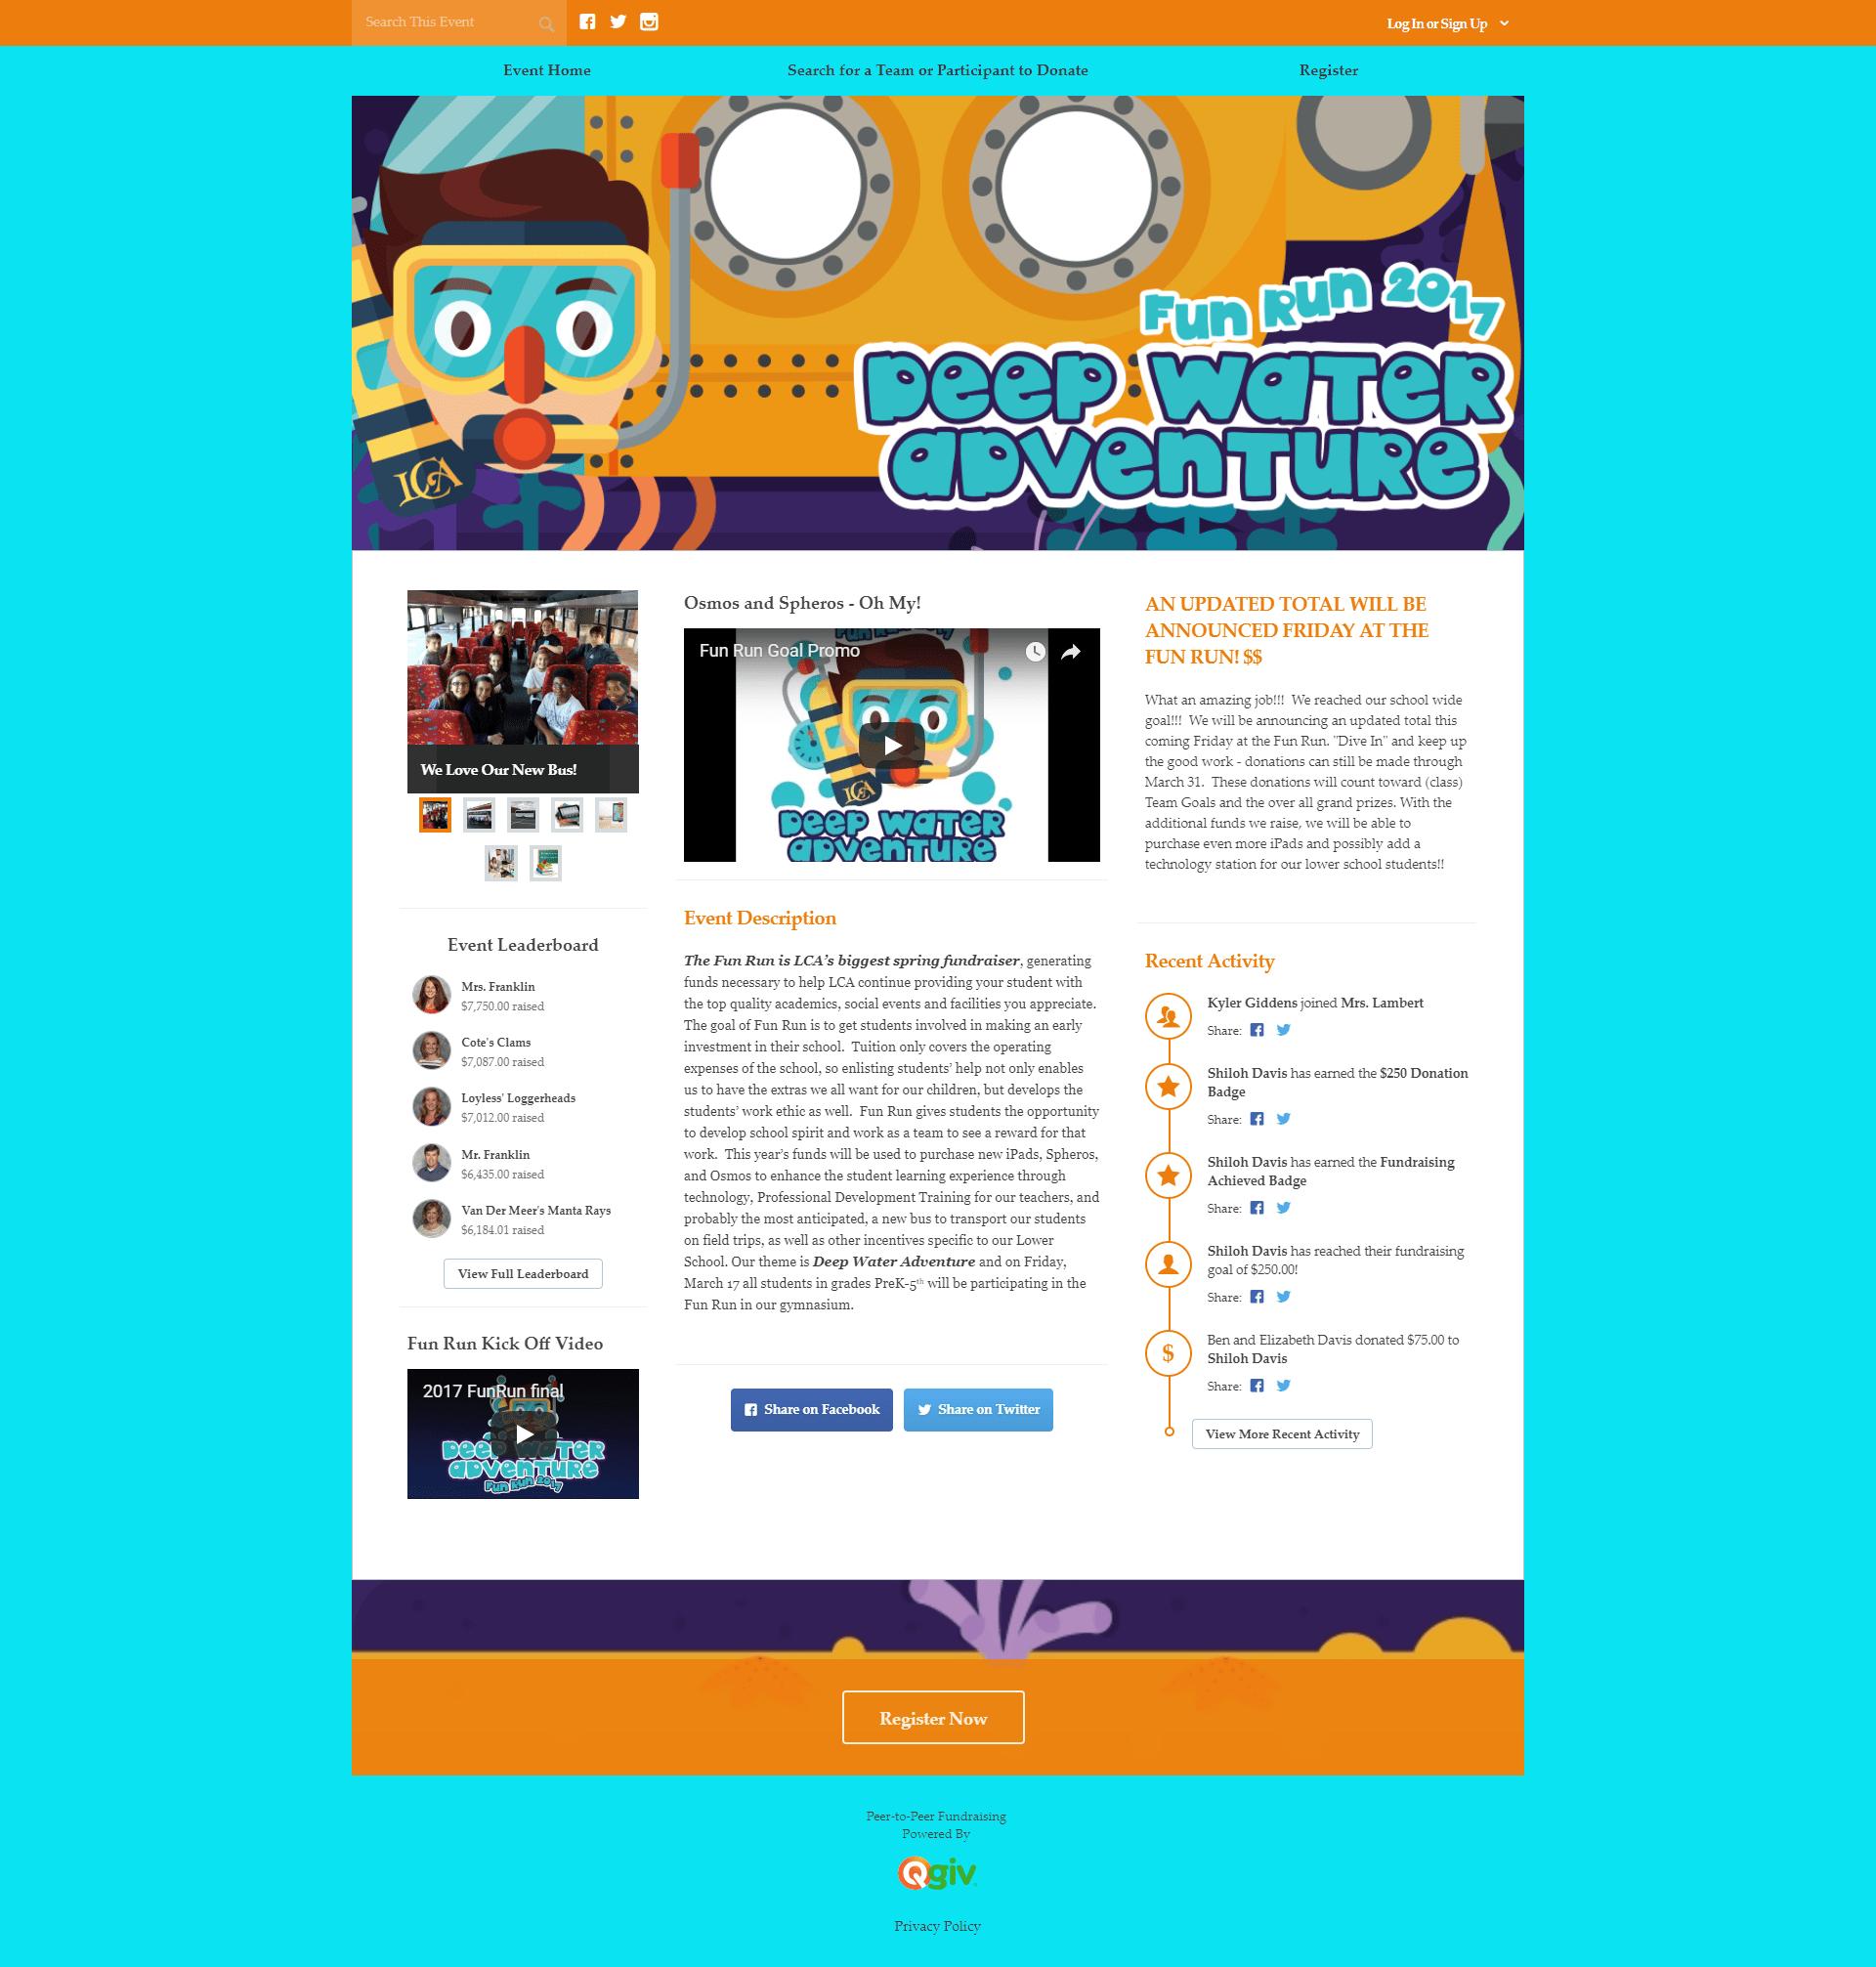 QGiv Fundraising Run Event Page Screenshot